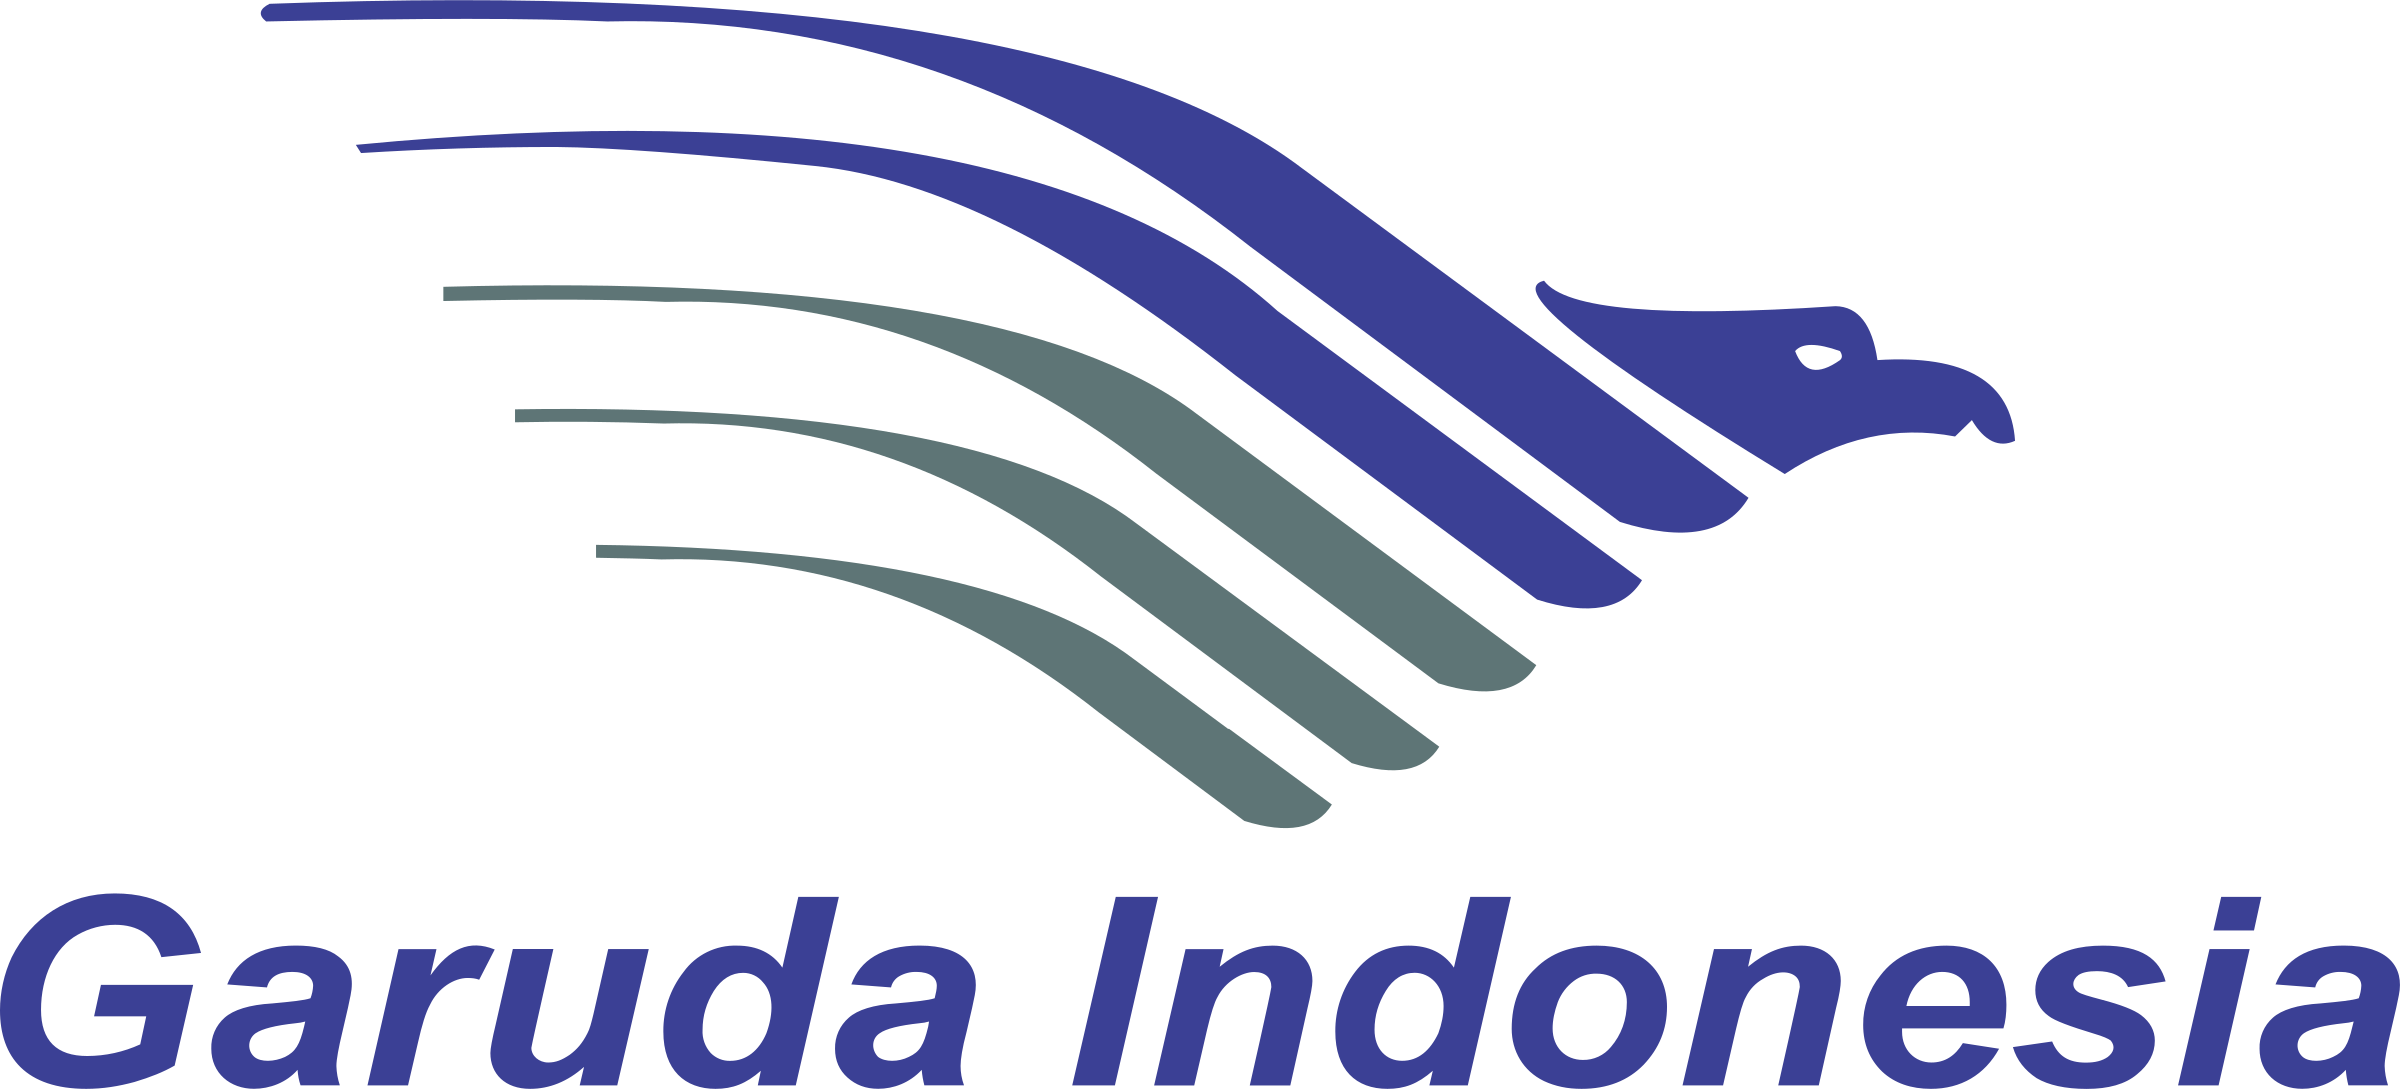 Garuda Indonesia Logo PNG Transparent & SVG Vector.